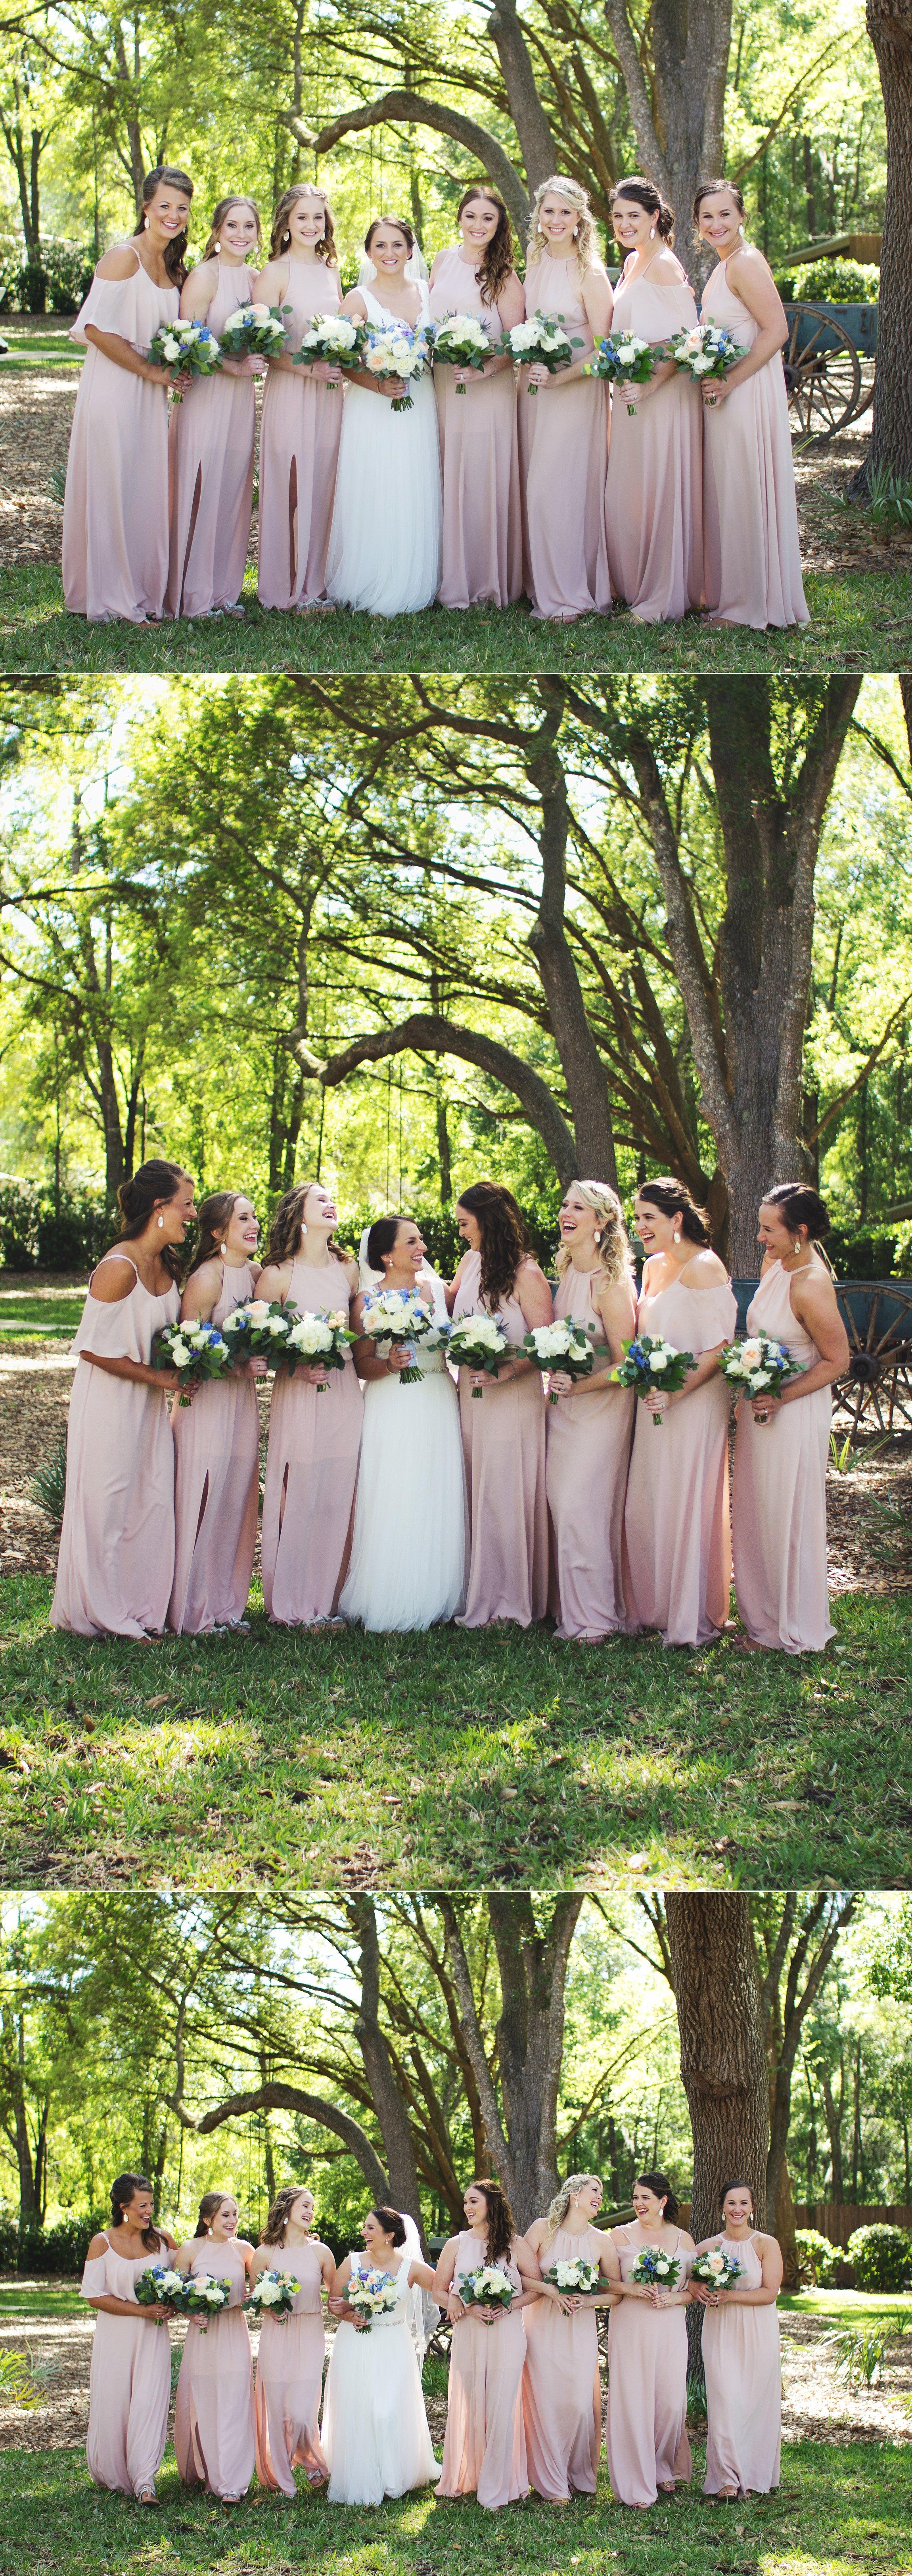 Jacksonville-Florida-Wedding-Photographer-West-House-Photography_0051.jpg